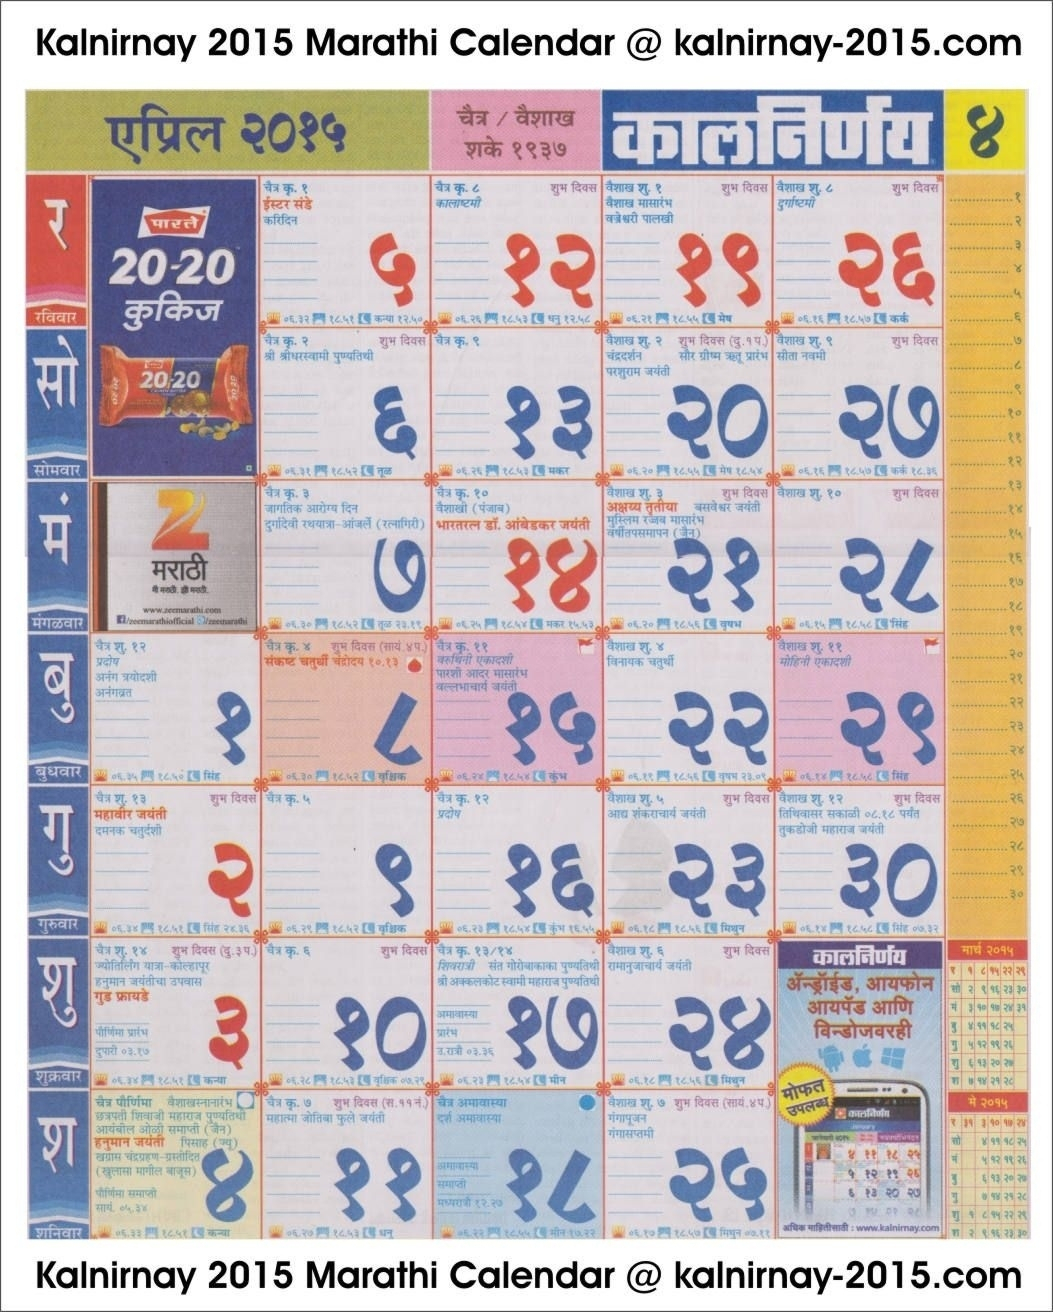 February 2020 Calendar Marathi | Calendar Template Information pertaining to Kalnirnay May 2020